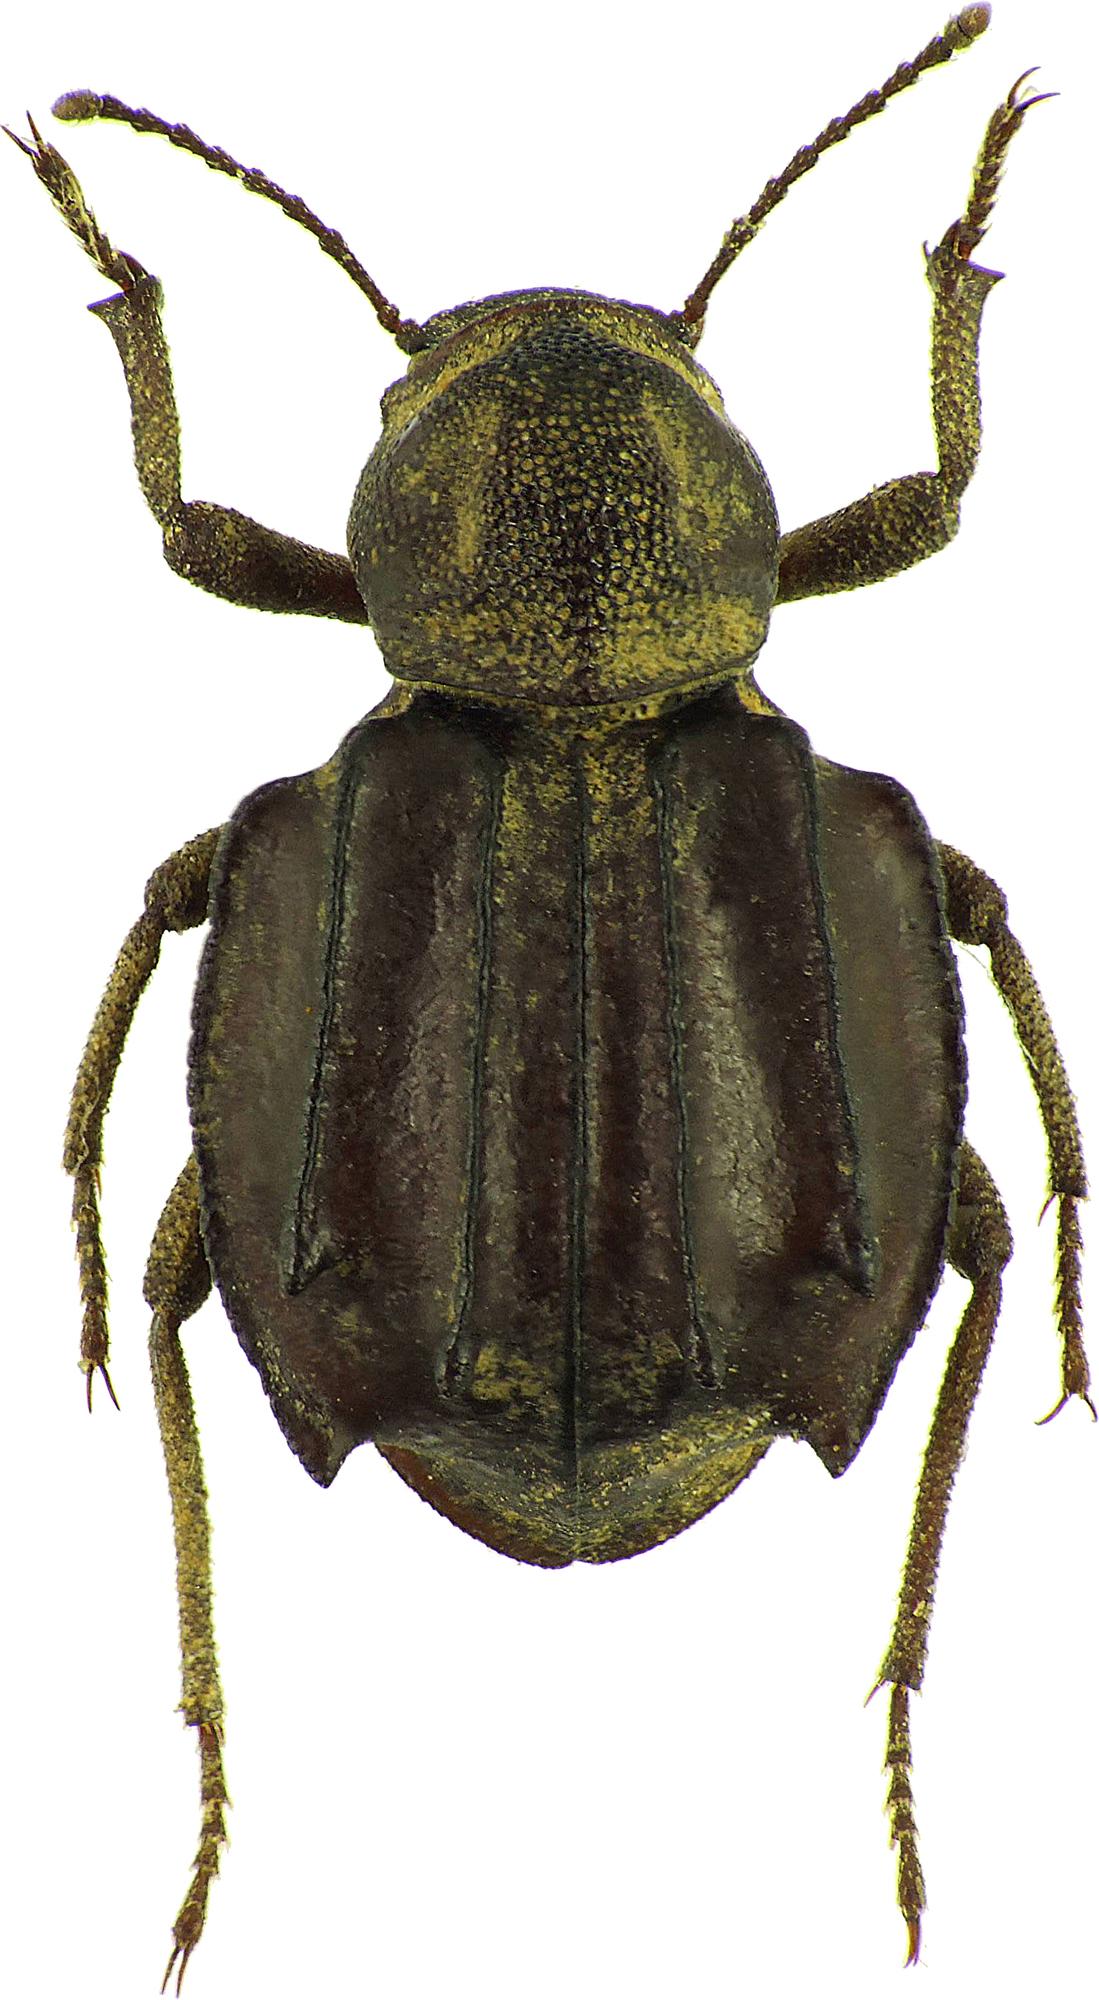 Euphrynus sexdentatus 24649cz55.jpg